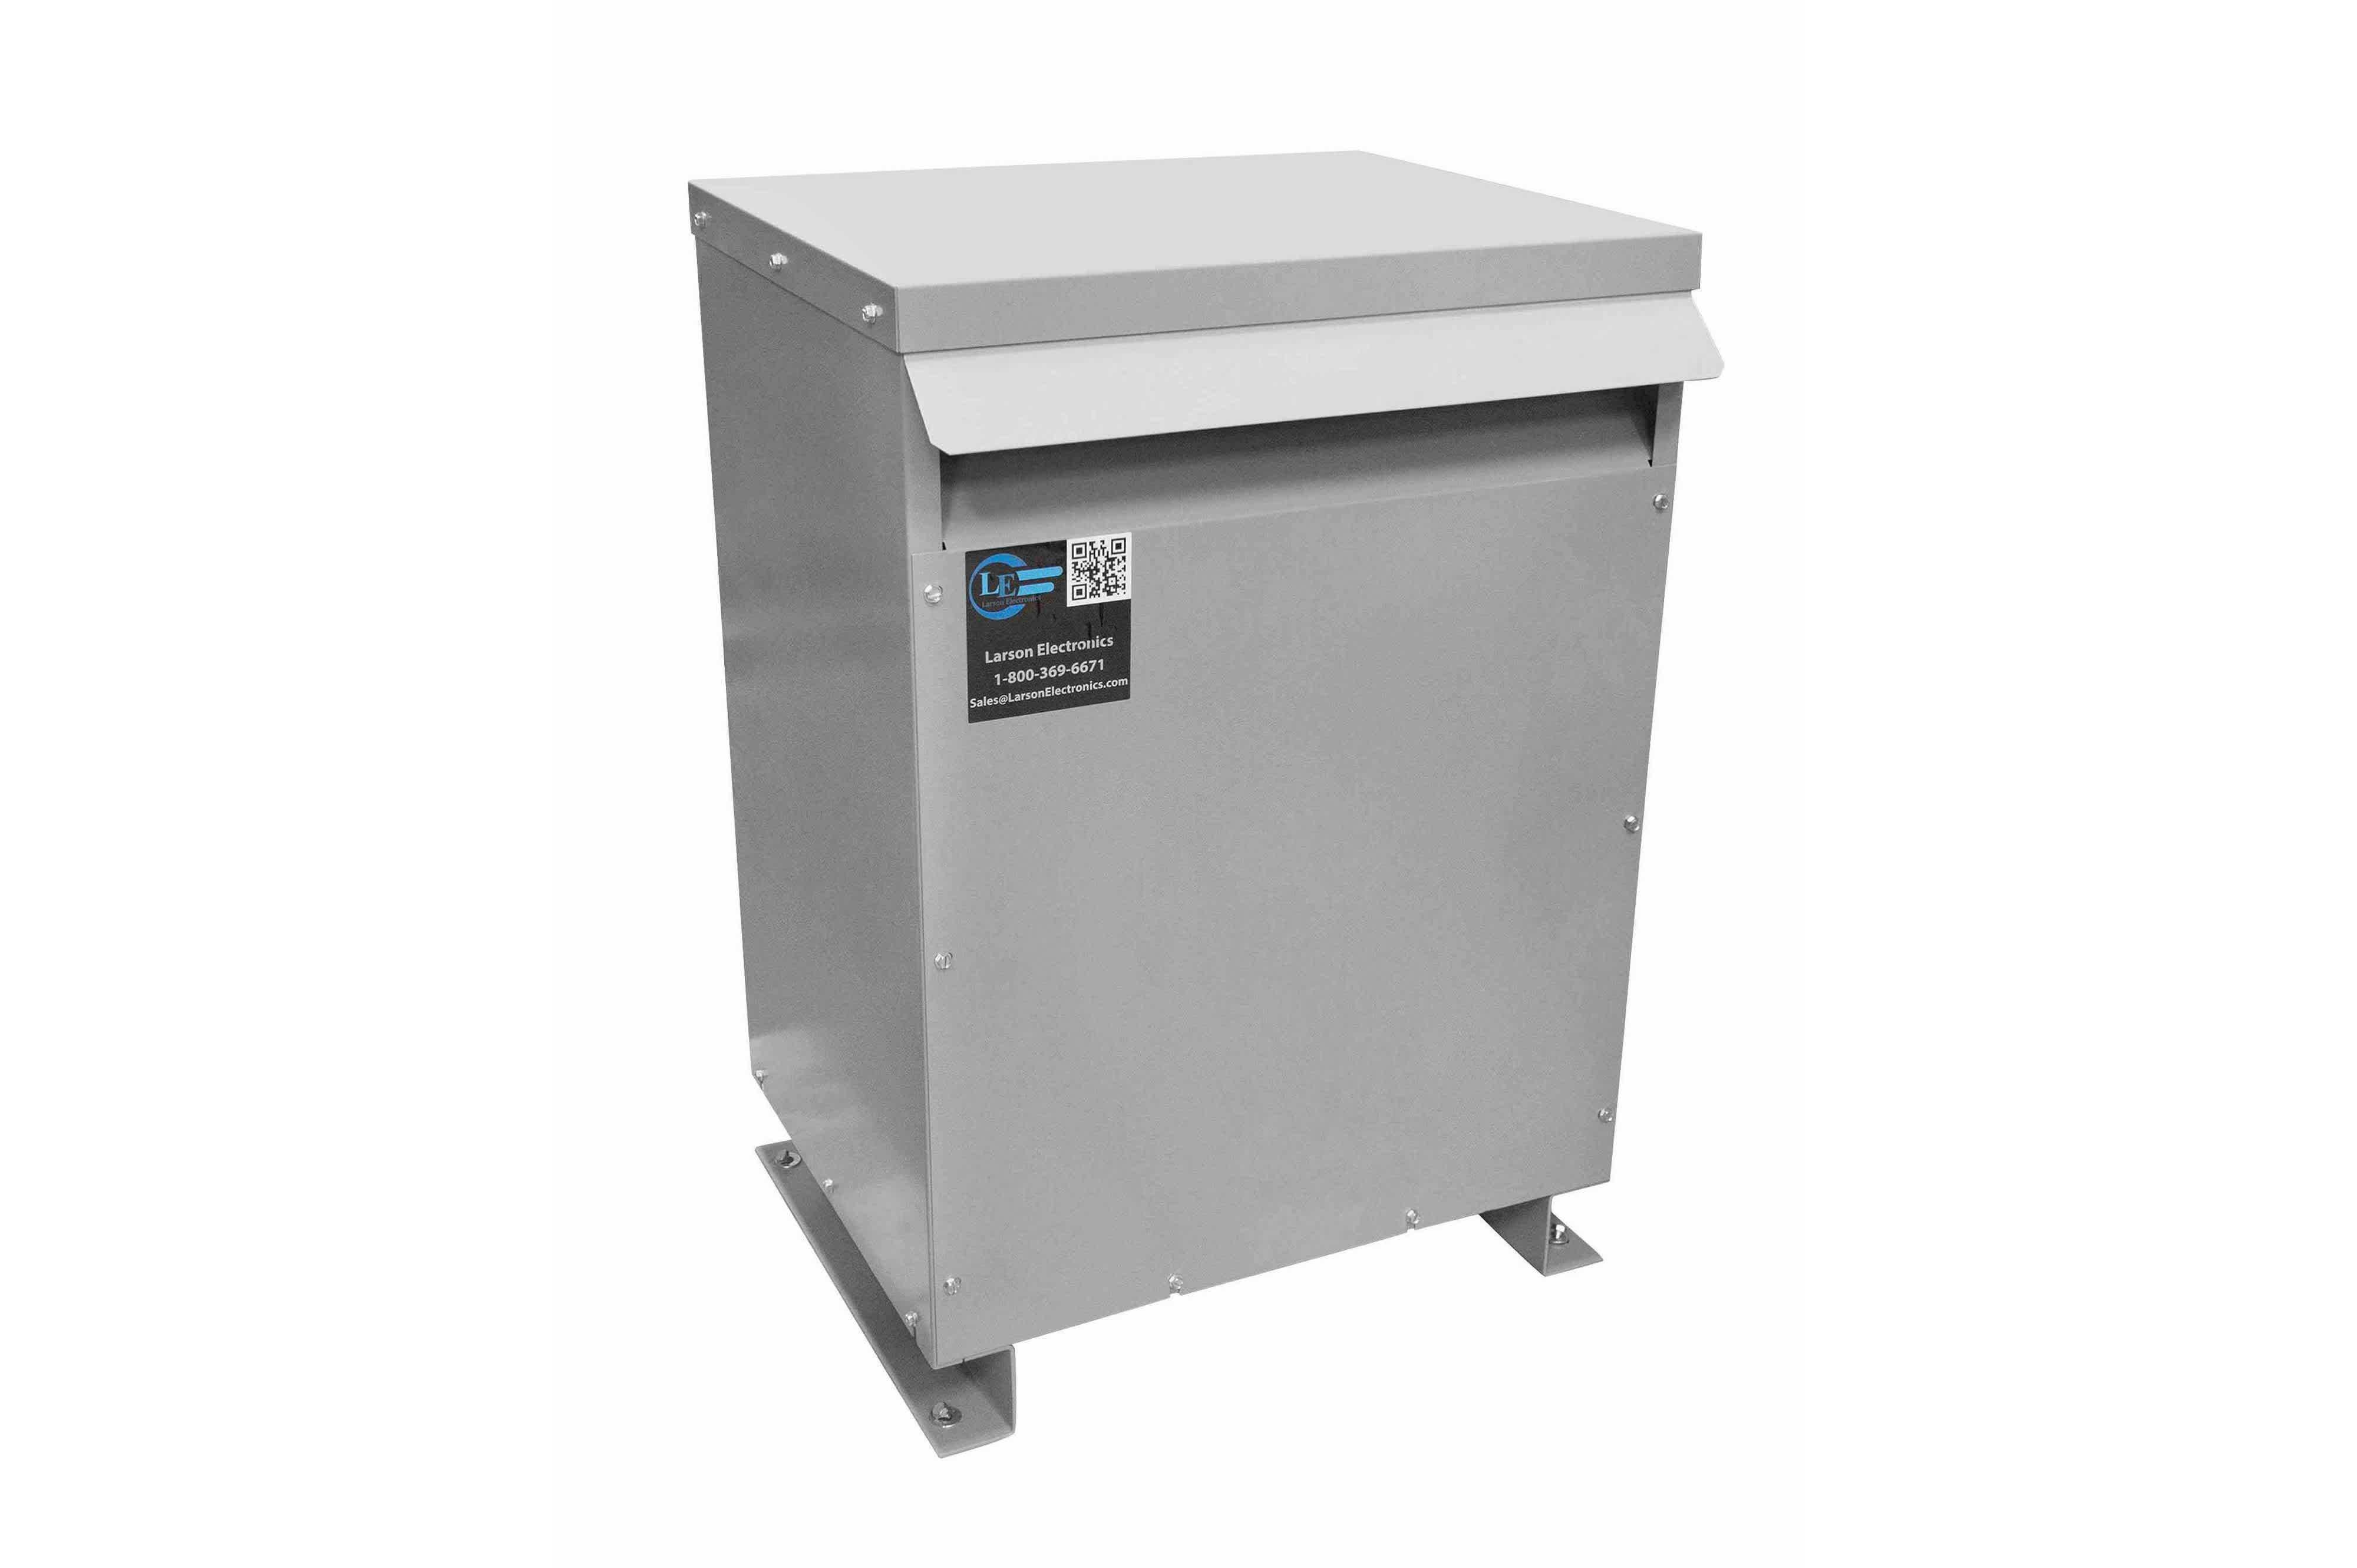 400 kVA 3PH Isolation Transformer, 600V Wye Primary, 460V Delta Secondary, N3R, Ventilated, 60 Hz